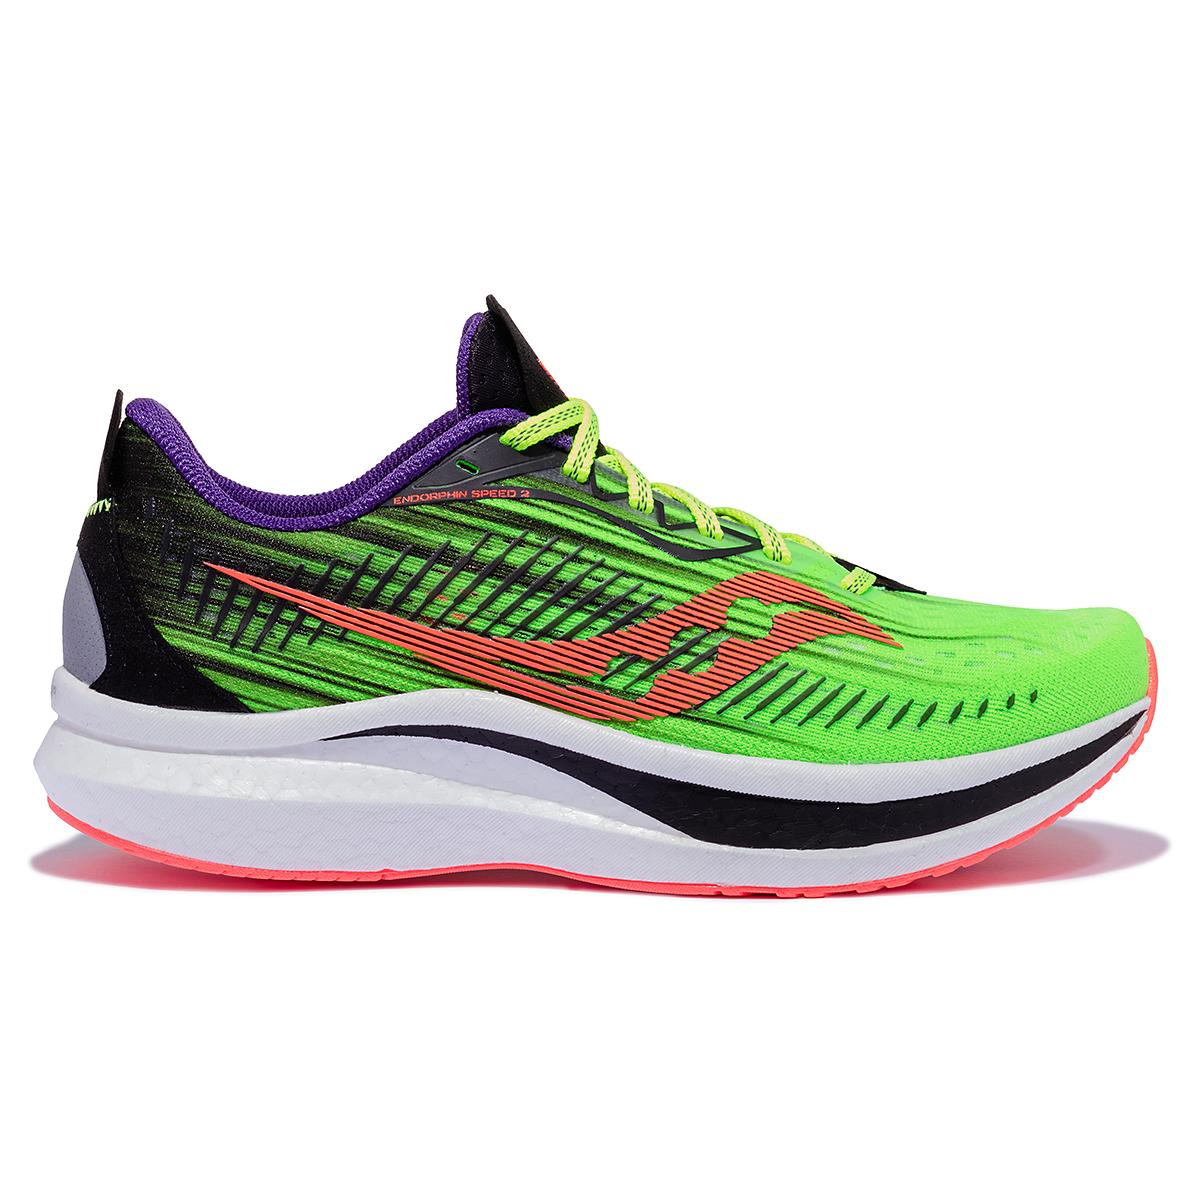 Men's Saucony Endorphin Speed 2 Running Shoe - Color: Vizipro - Size: 7 - Width: Regular, Vizipro, large, image 1